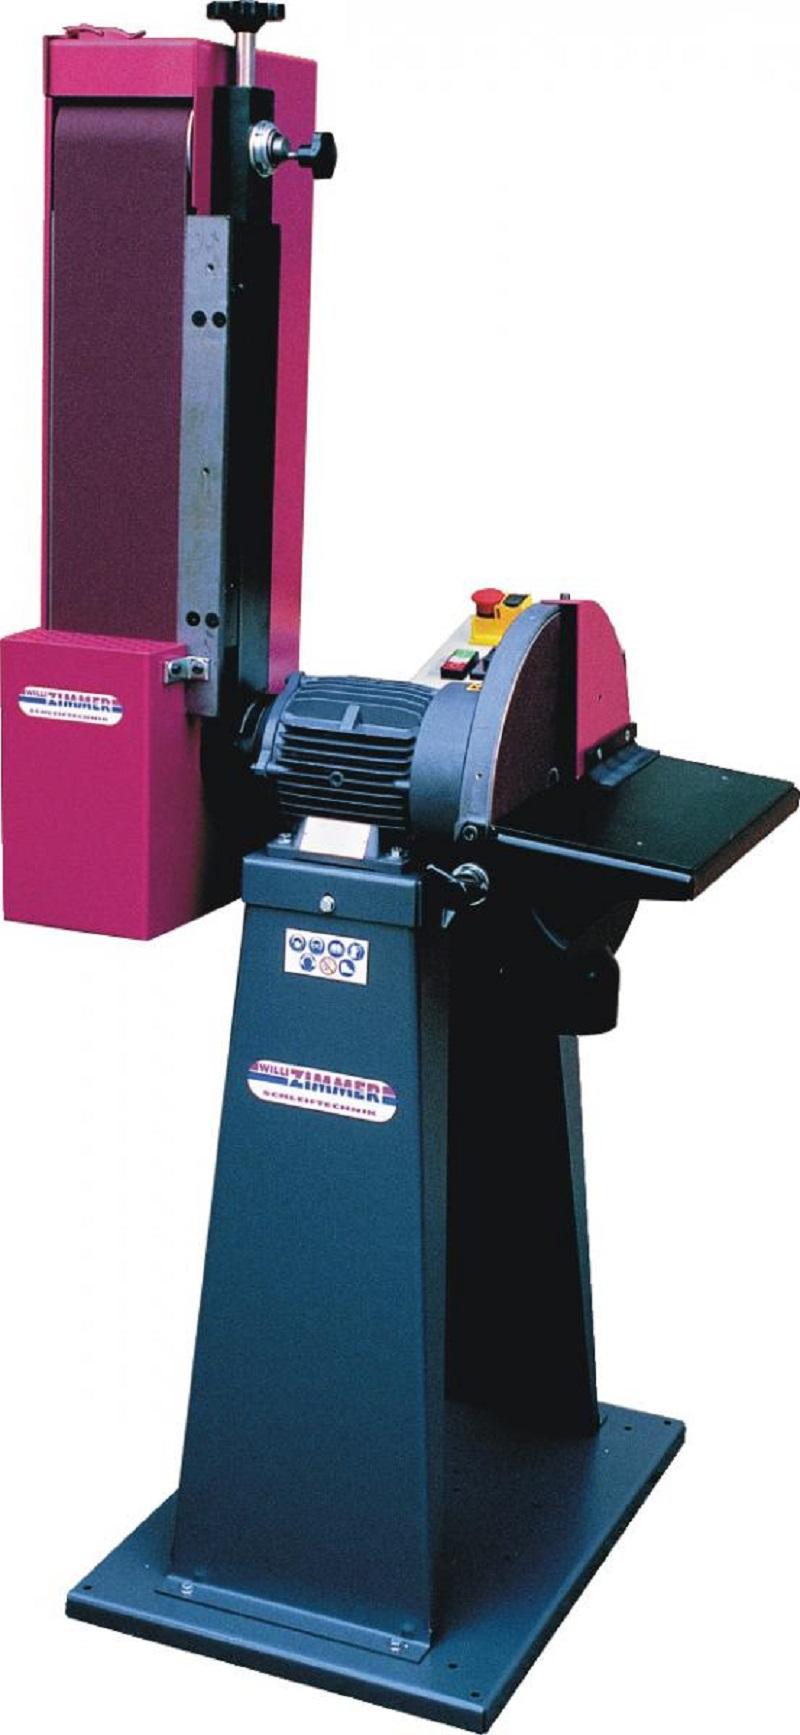 ZIMMER Rasant 343/2 inkl. Maschinensockel Horizontal- und Vertikalbandschleifmaschine